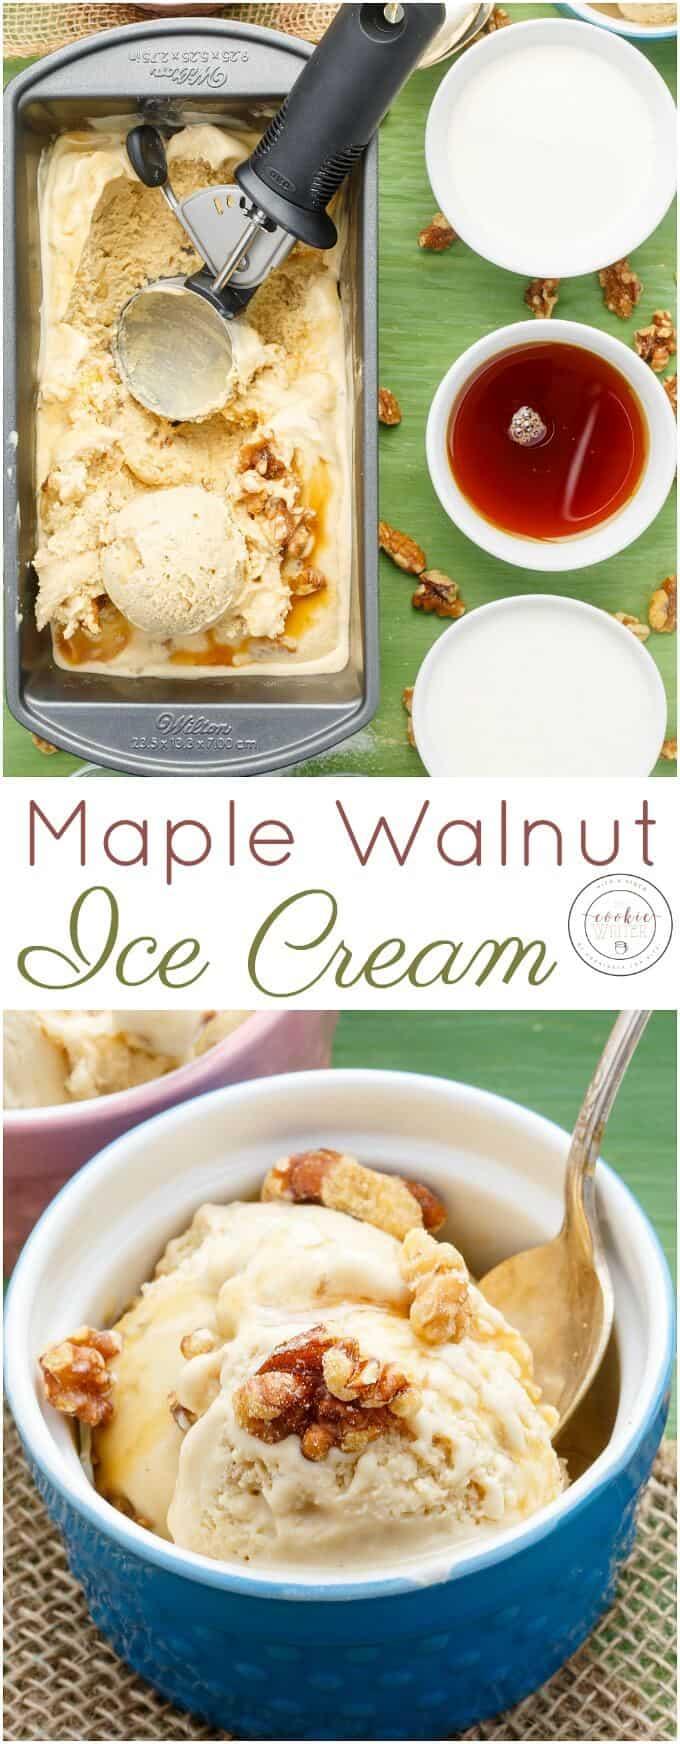 Homemade Maple Walnut Ice Cream